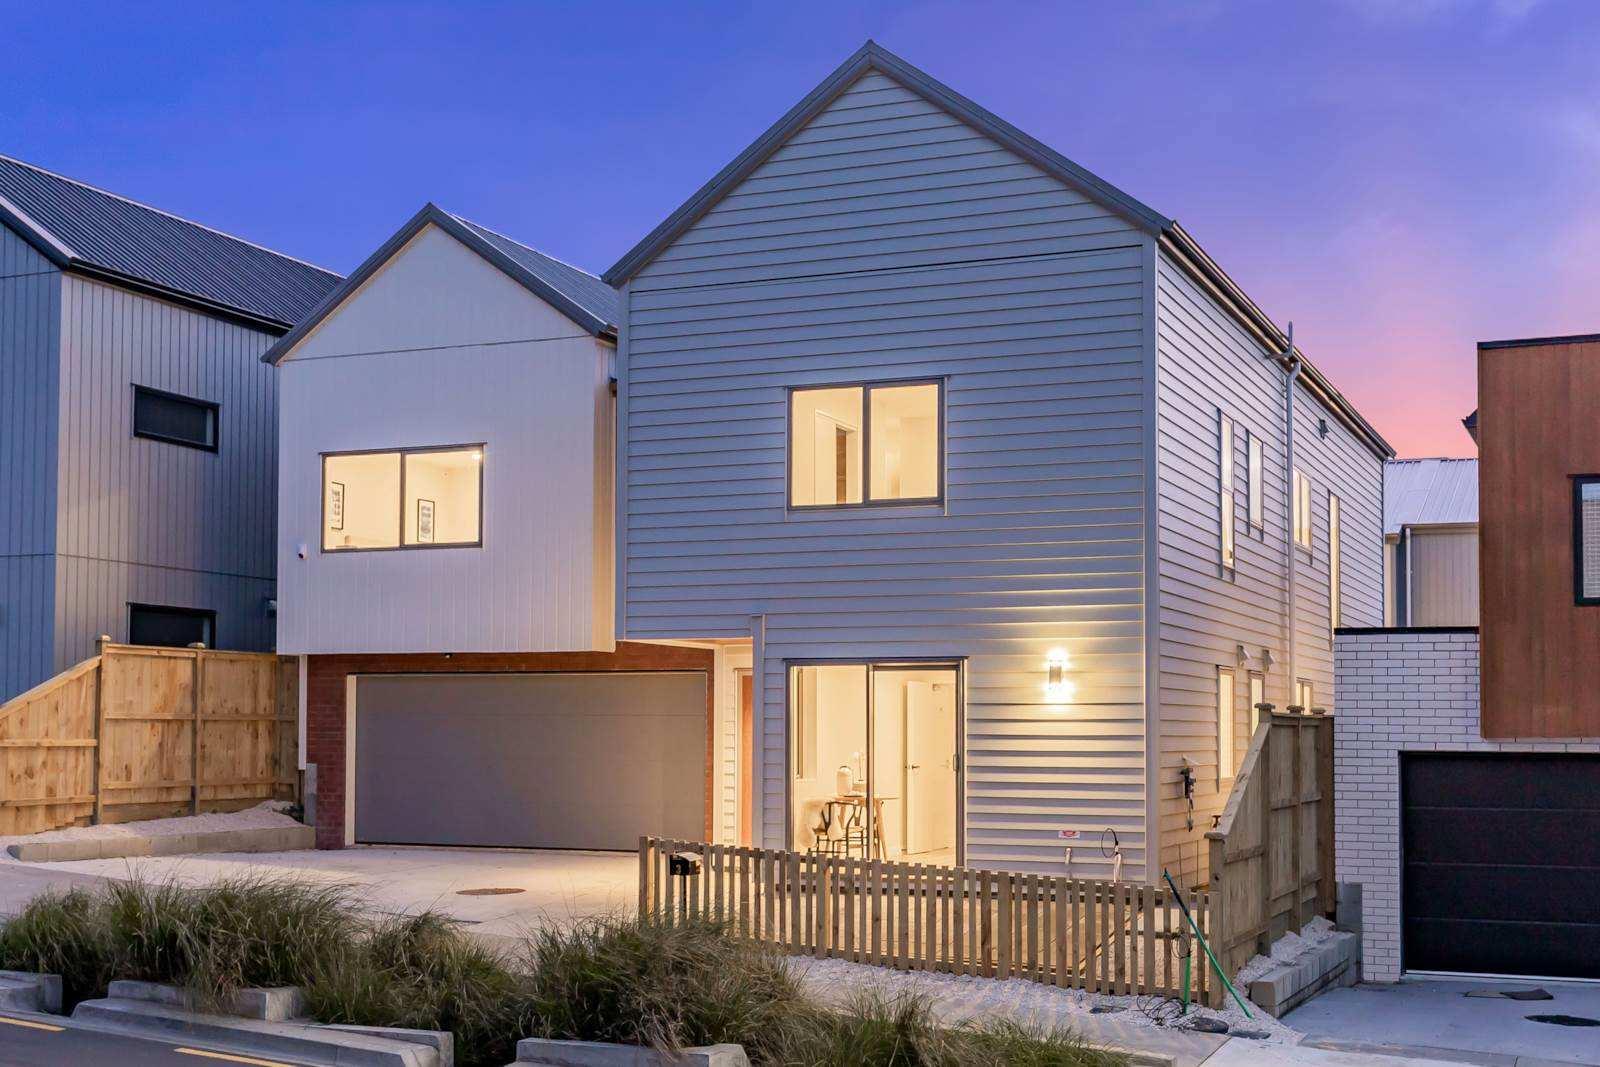 Hobsonville 6房 全新品质靓宅 空间开阔 可信赖原材料建造 配置品质家居配件 好校近距离 轮渡出行 自住/投资两相宜 Brand New Legal Home & Income